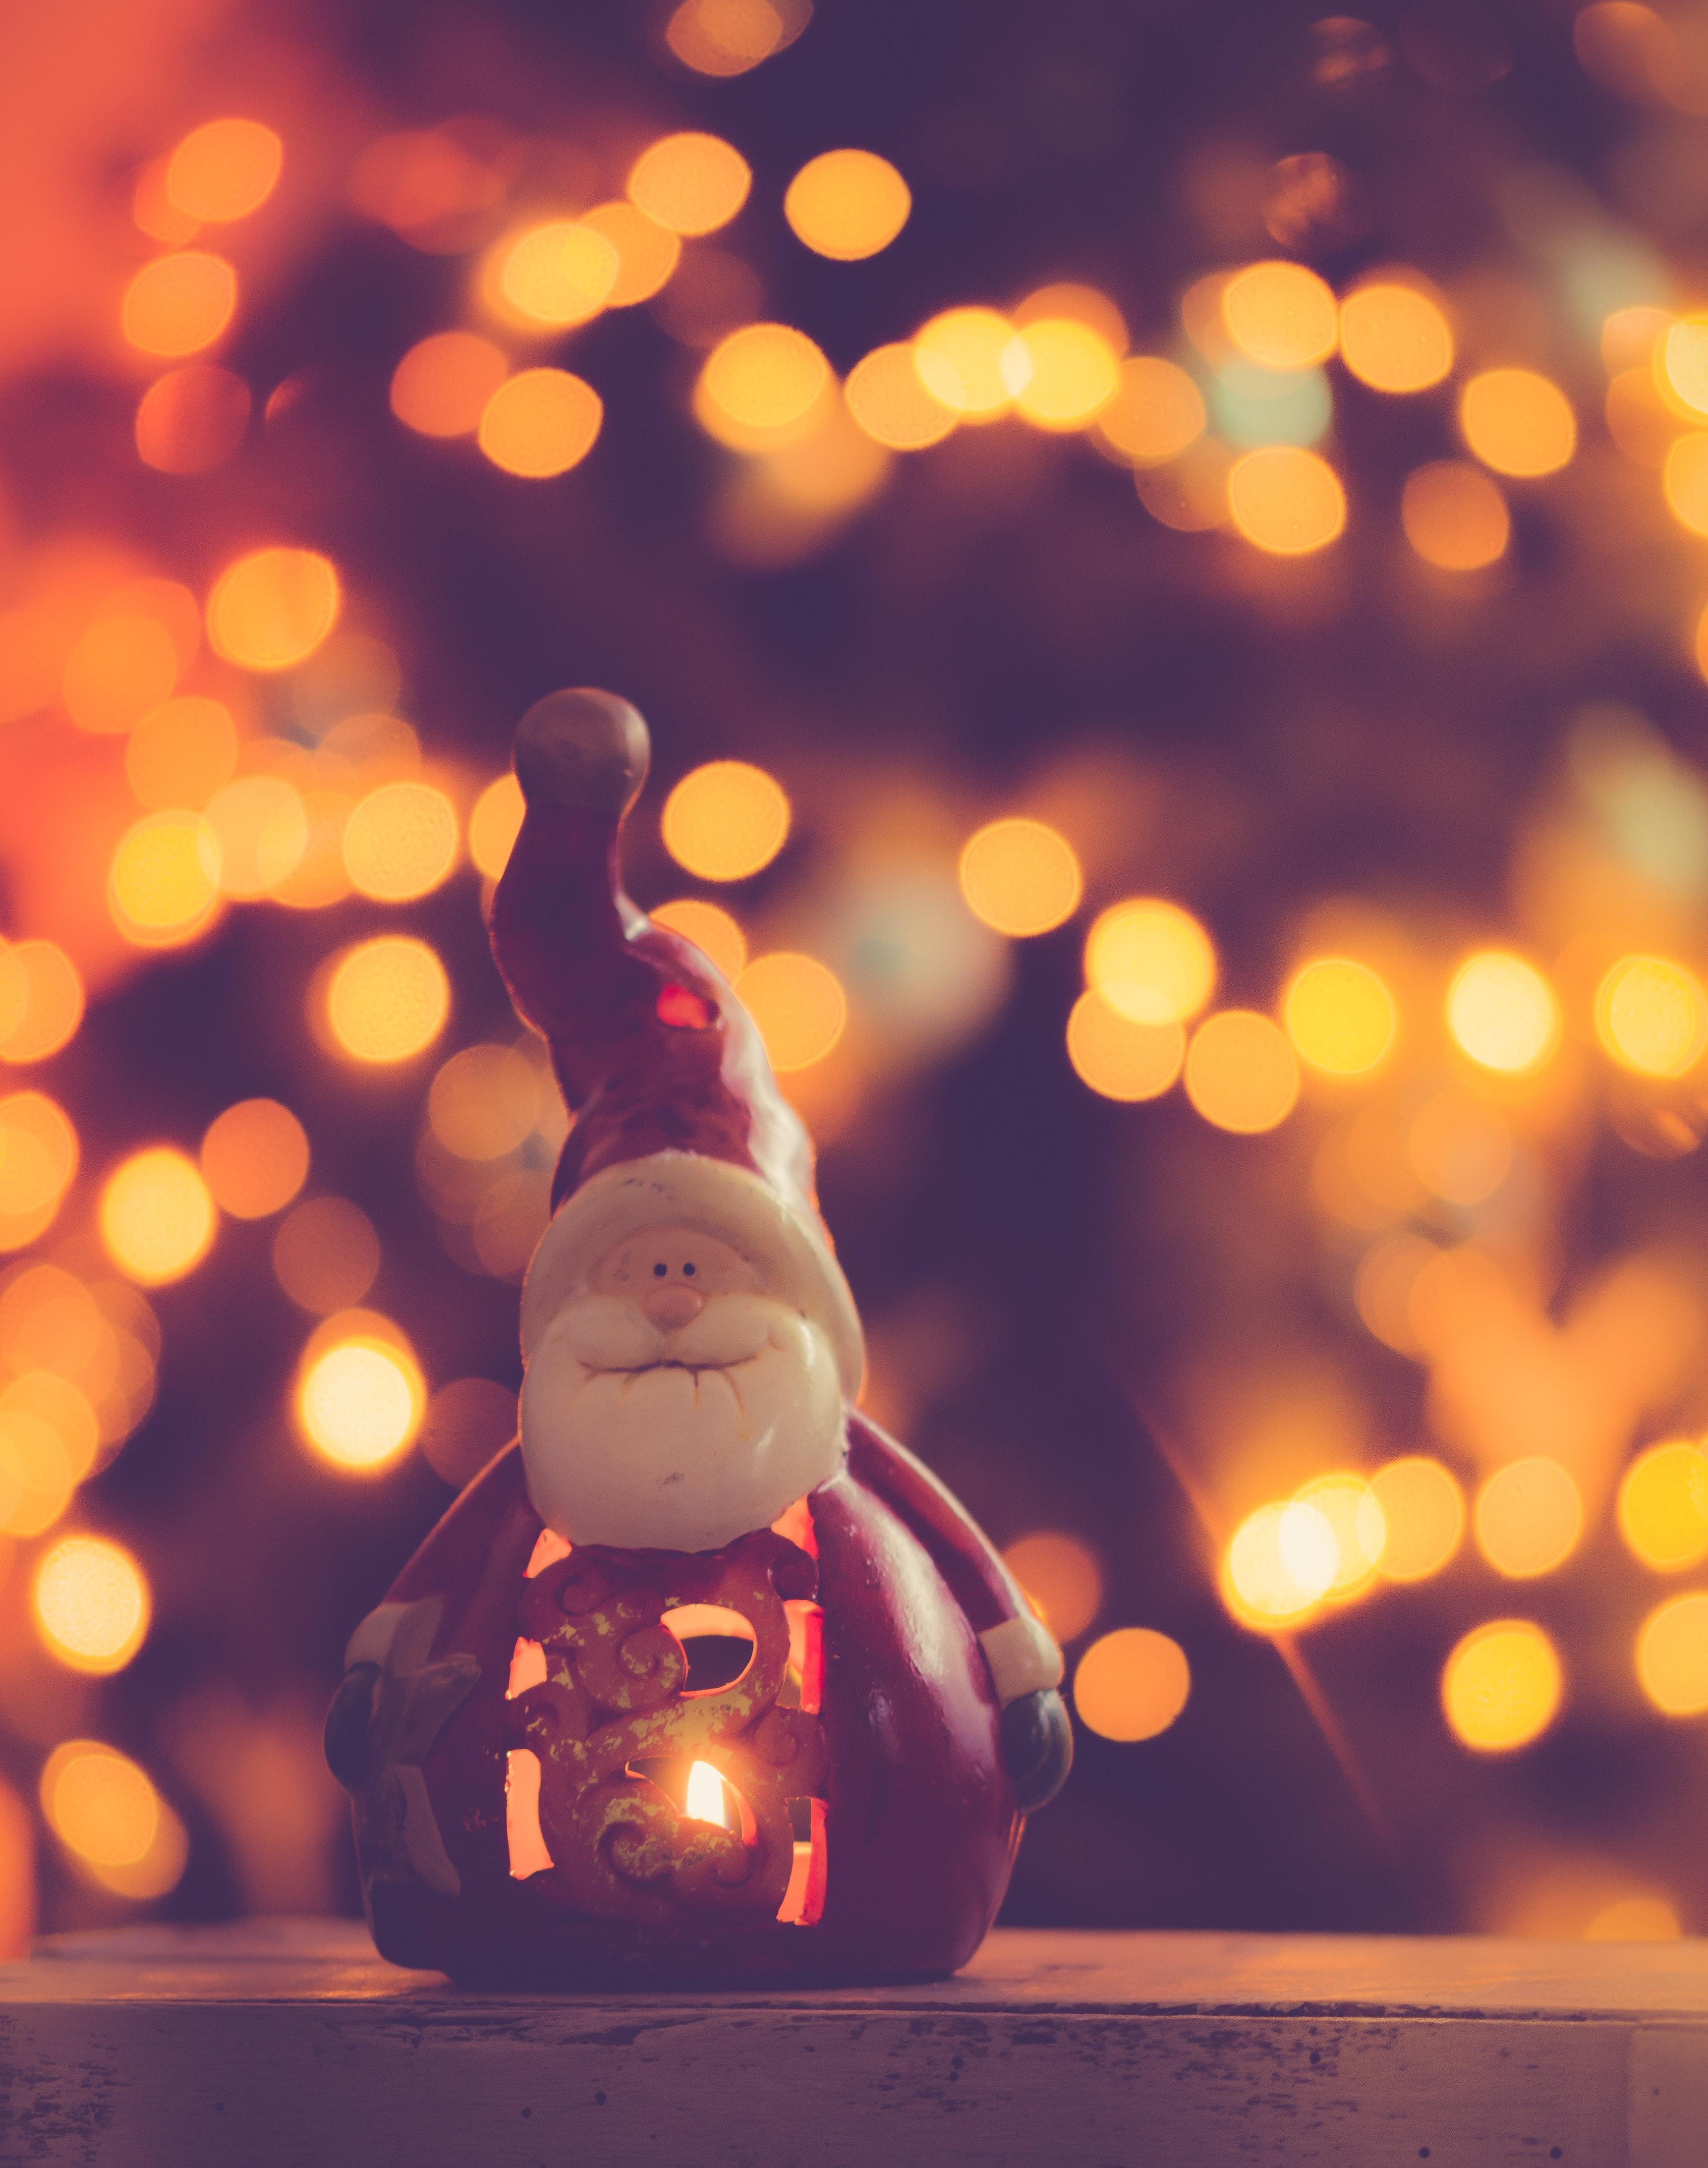 Red and White Ceramic Santa Claus Figurine, Background, Santa claus, Lights, Lamp, HQ Photo